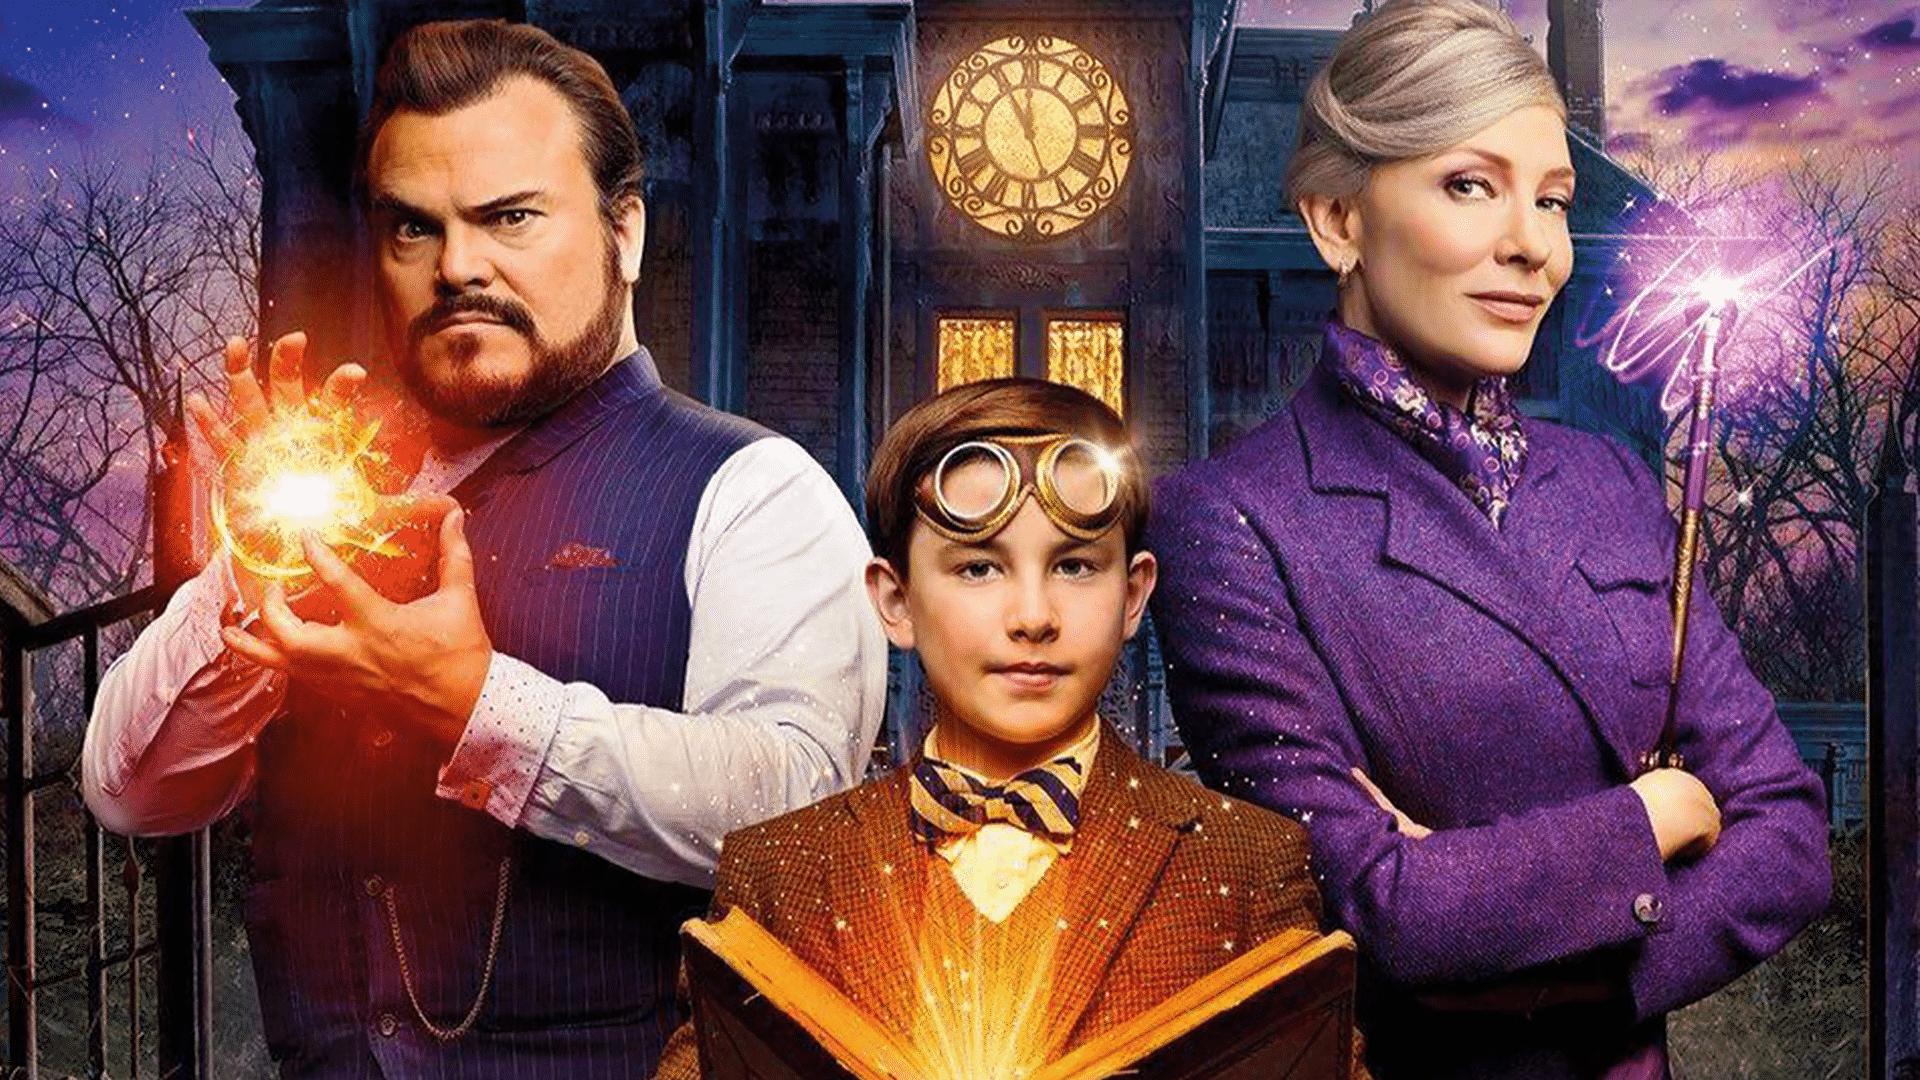 film Tajomstvo domu s hodinami